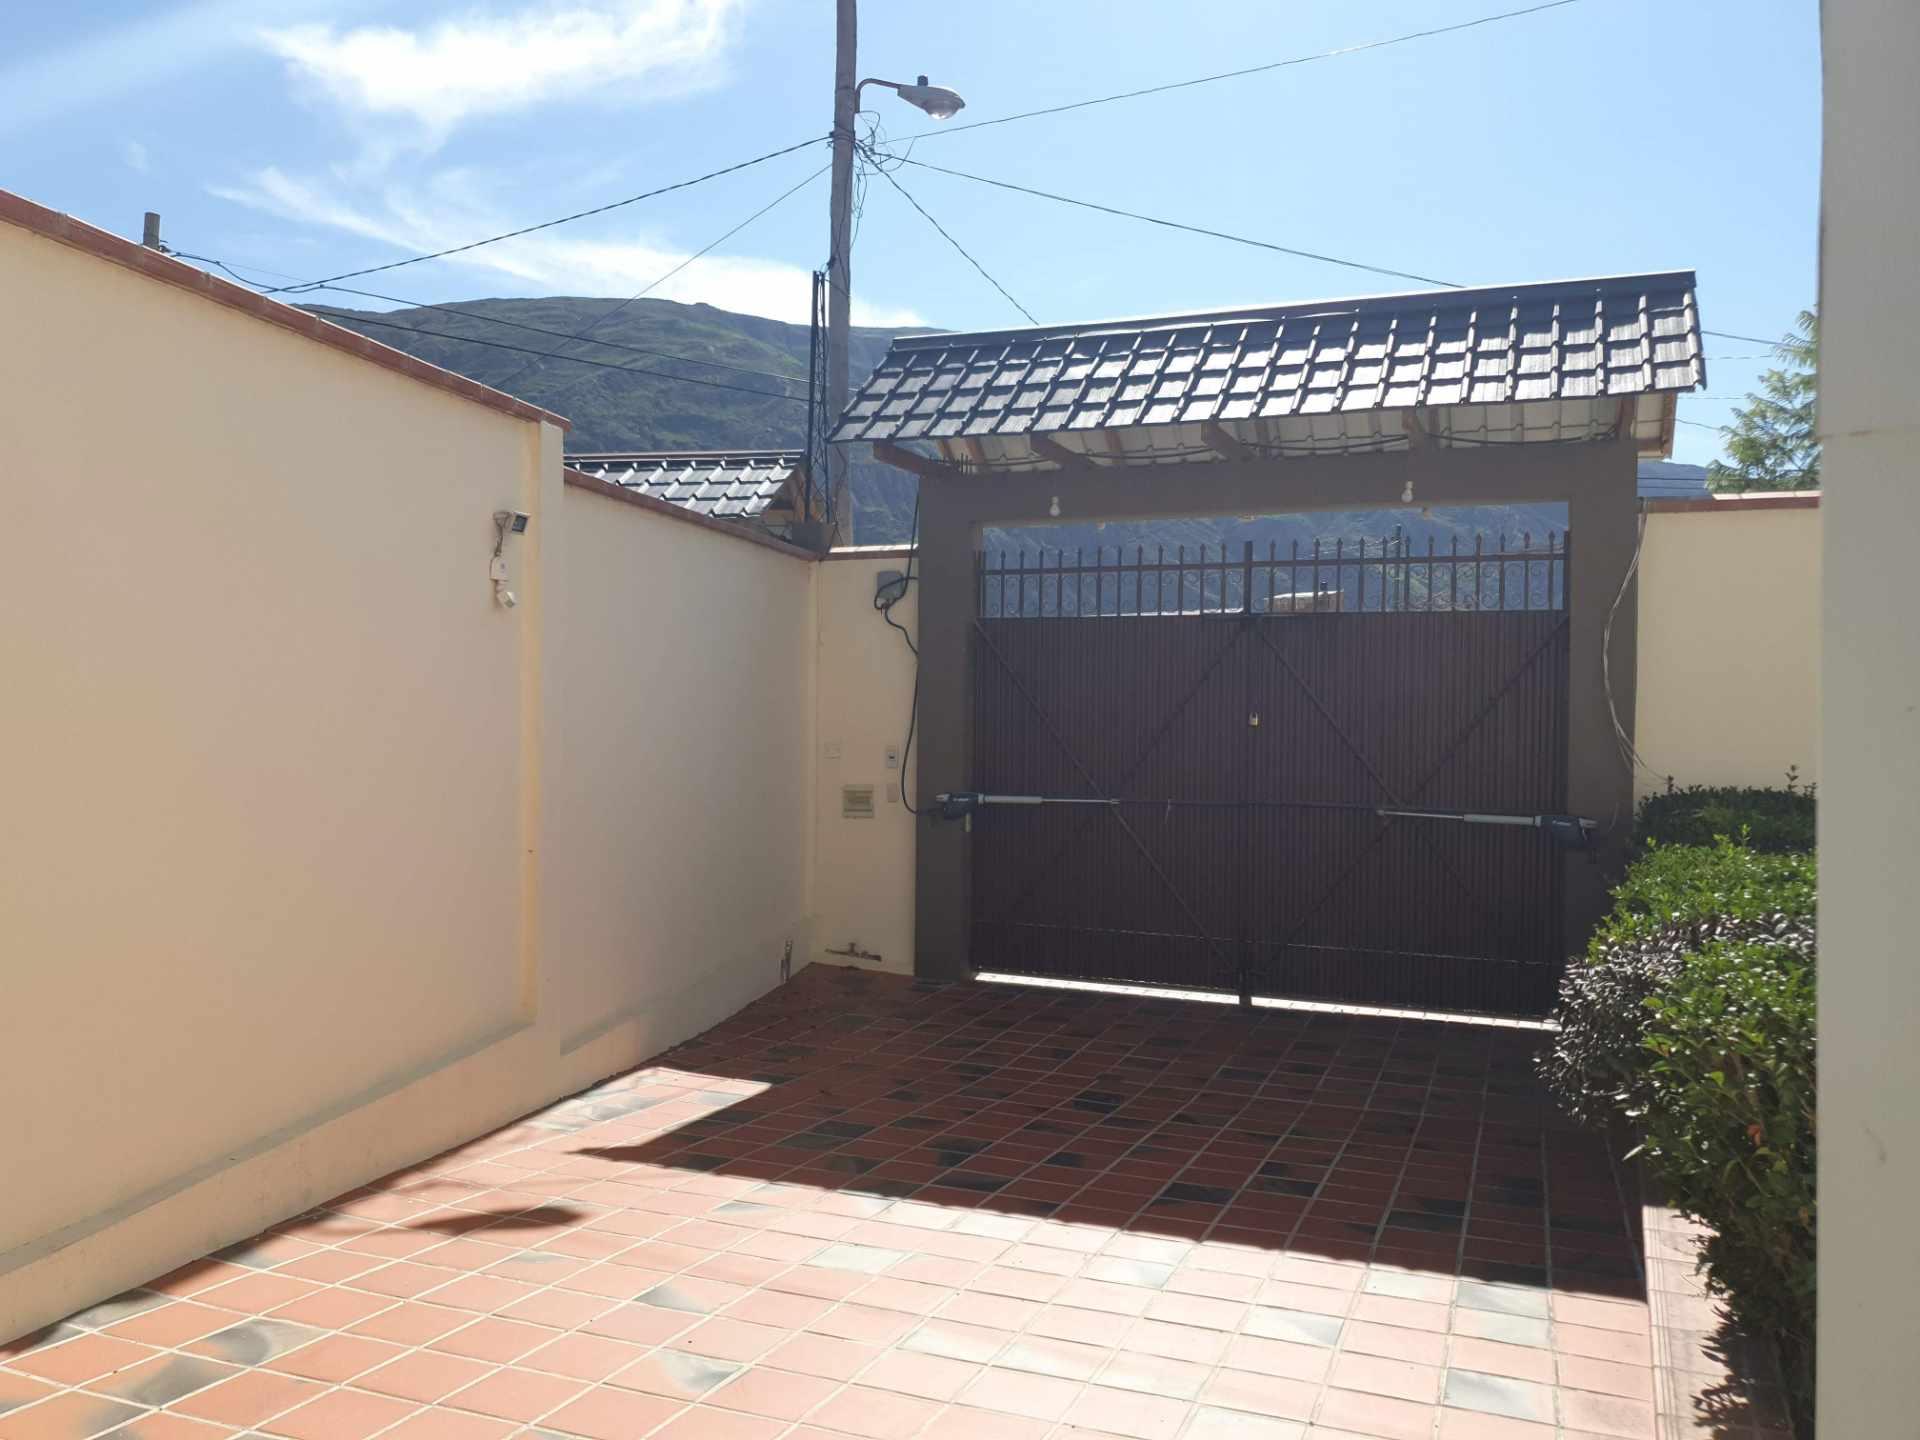 Casa en Venta Zona Sur, Huajchilla. Urbanizacion Bartos. Foto 10